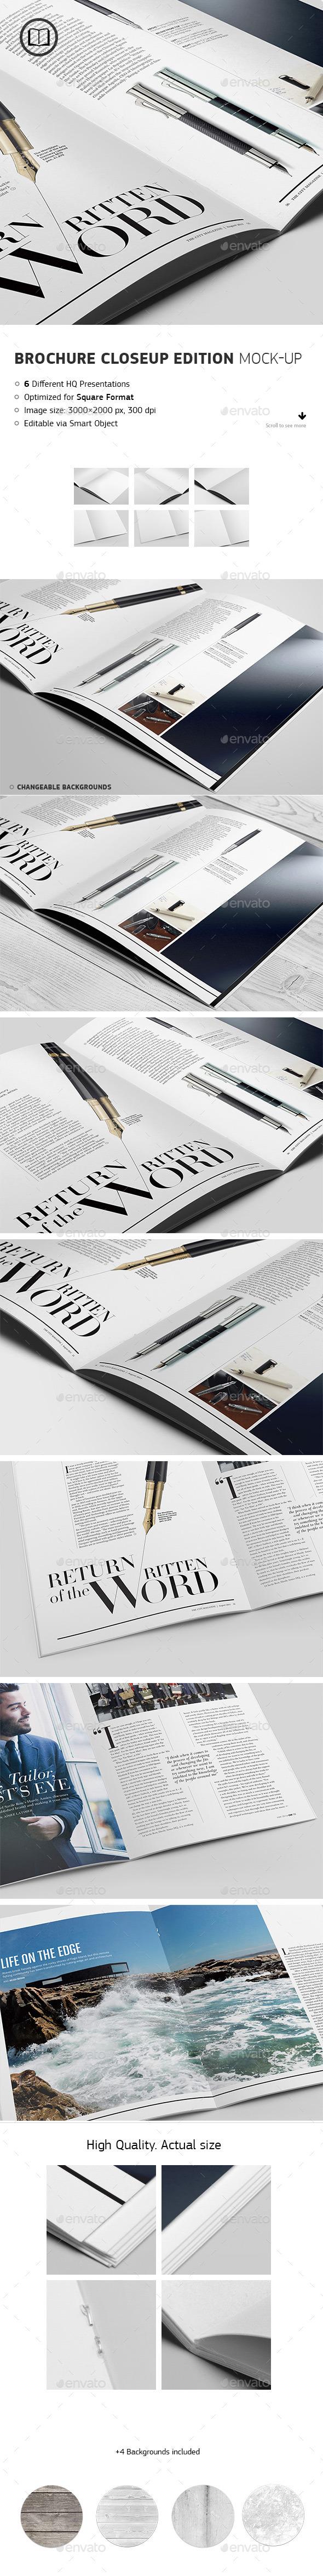 GraphicRiver Brochure Catalog Closeup Edition Mockup 8860893